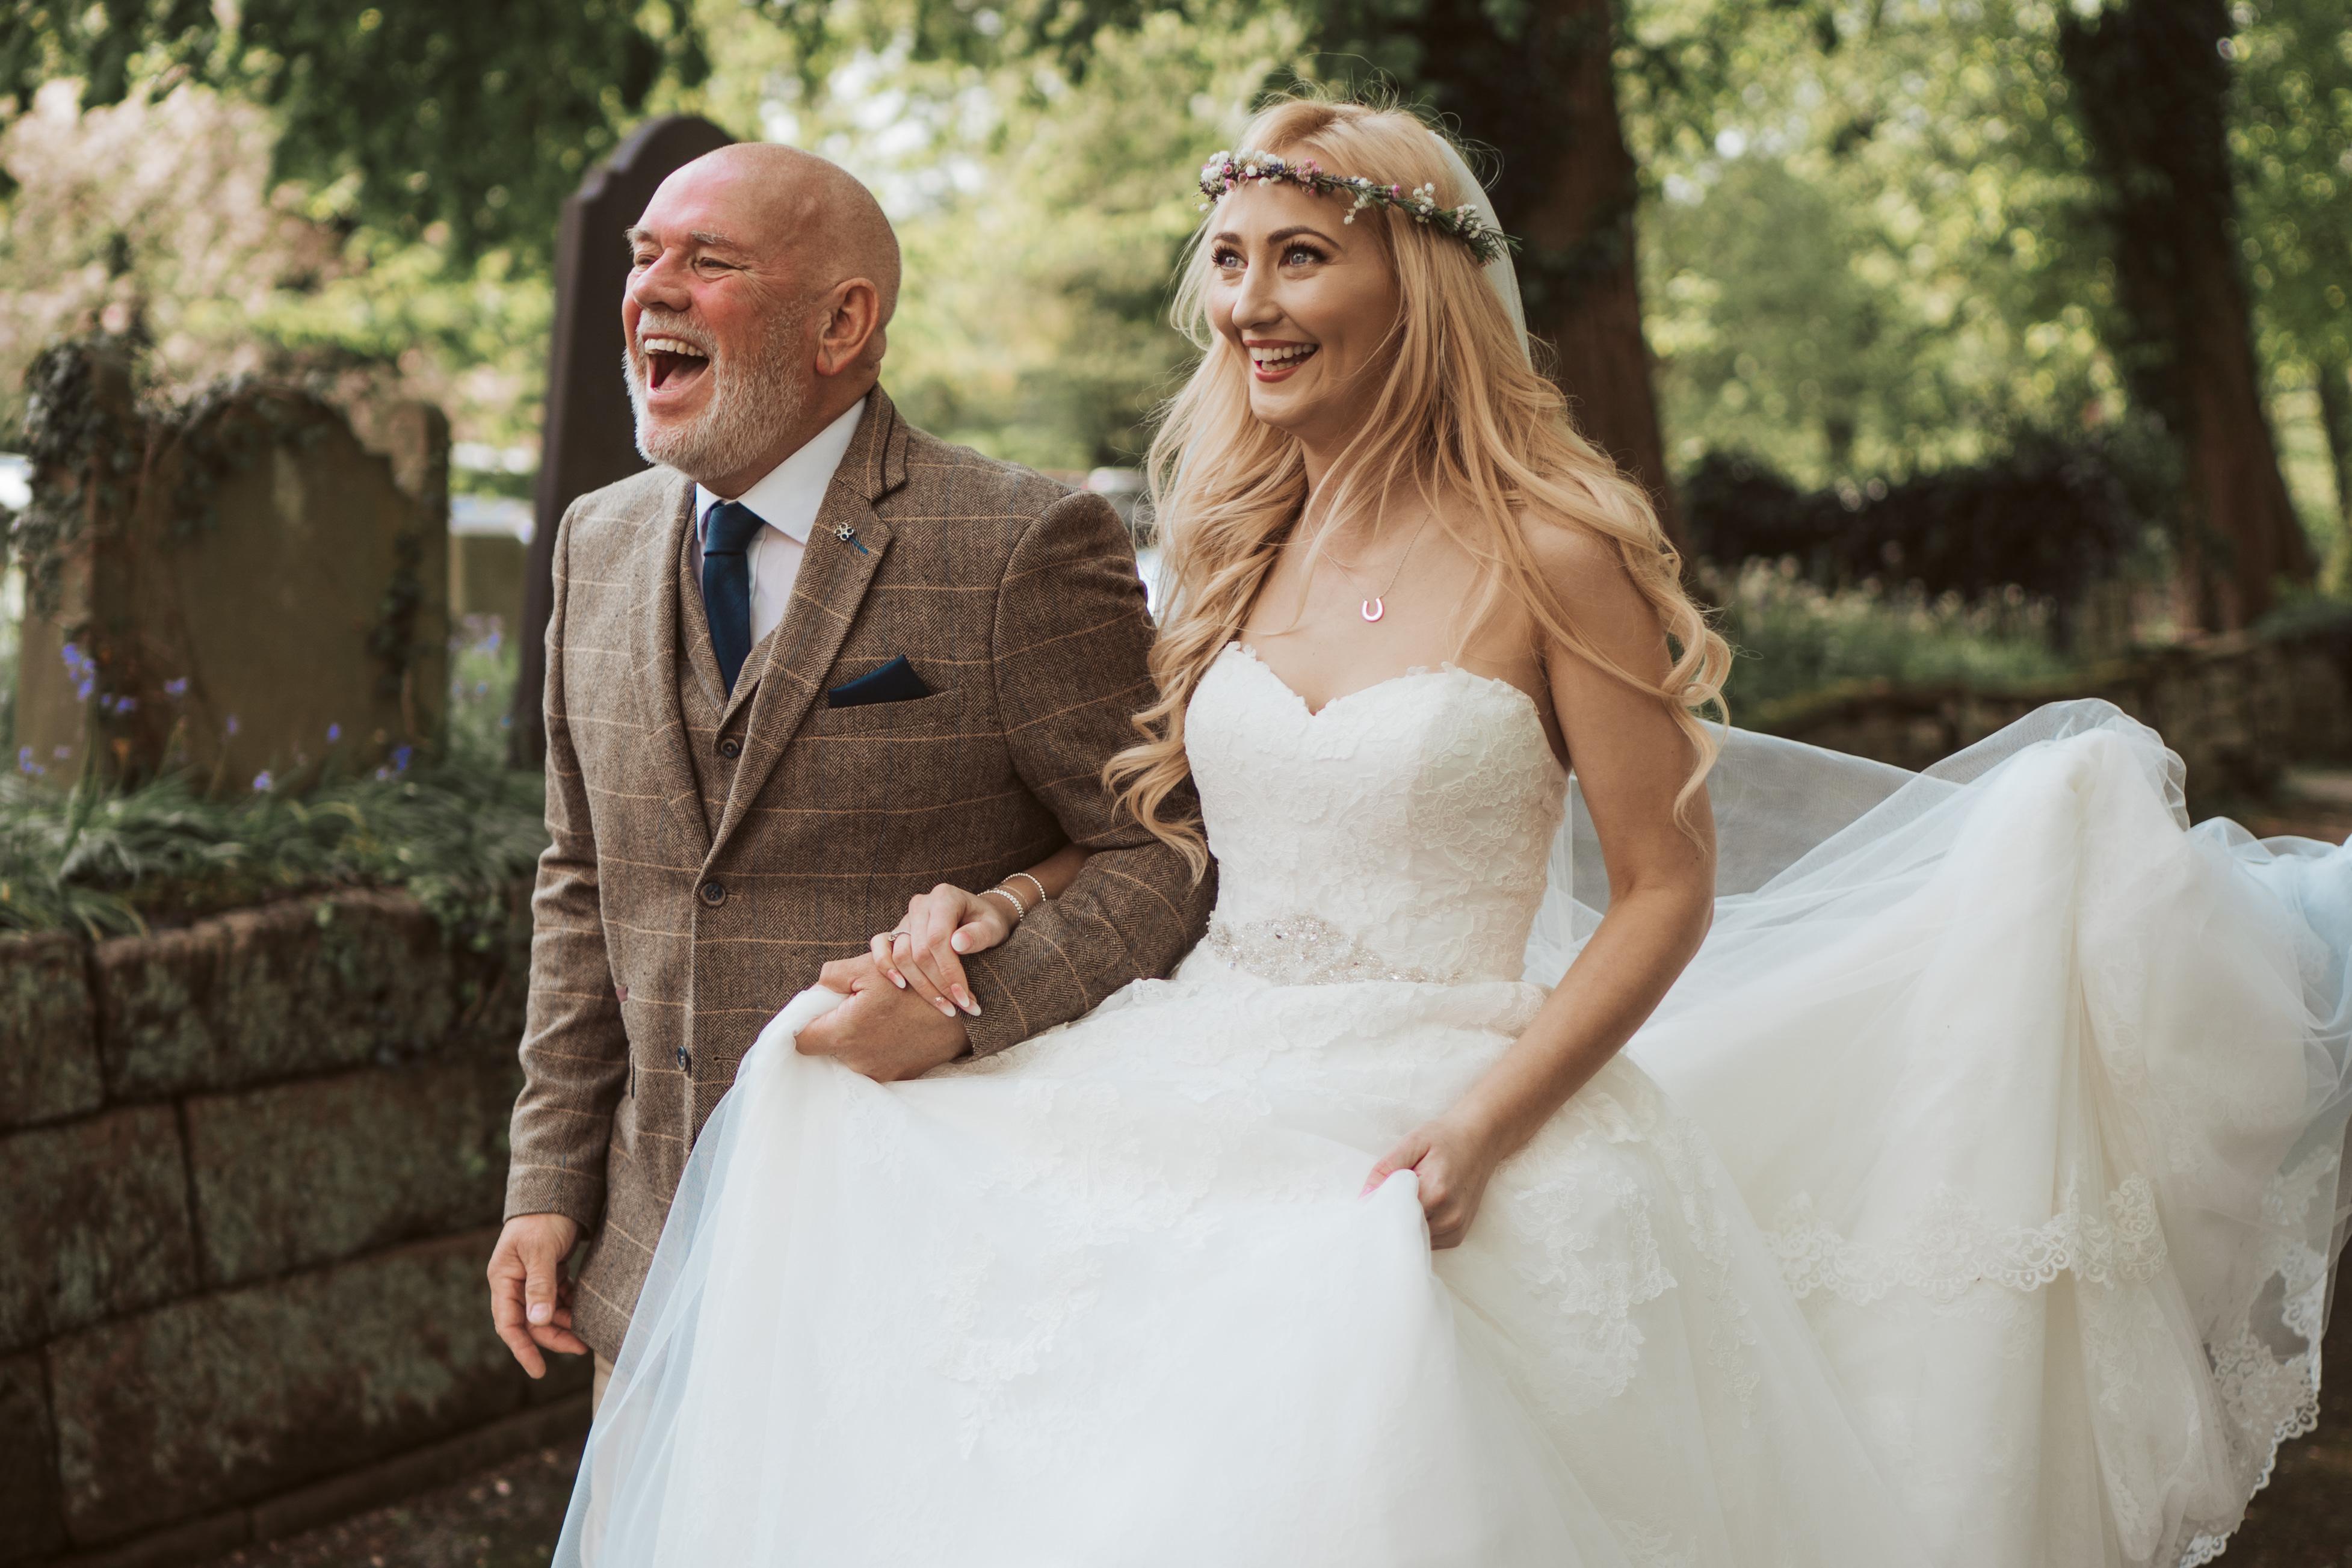 Cheshire_Brides-13-14